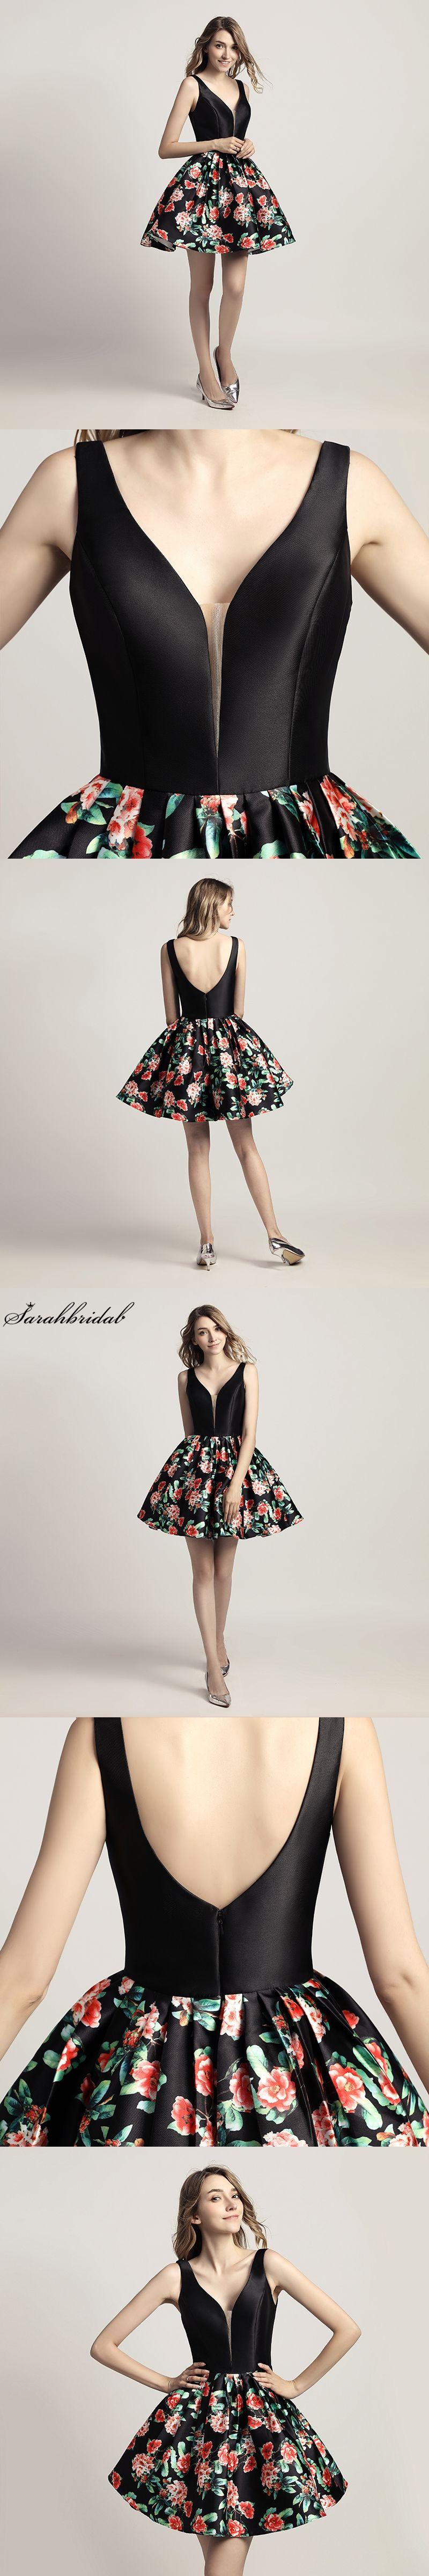 New arrivals floral print short prom dresses with v neck